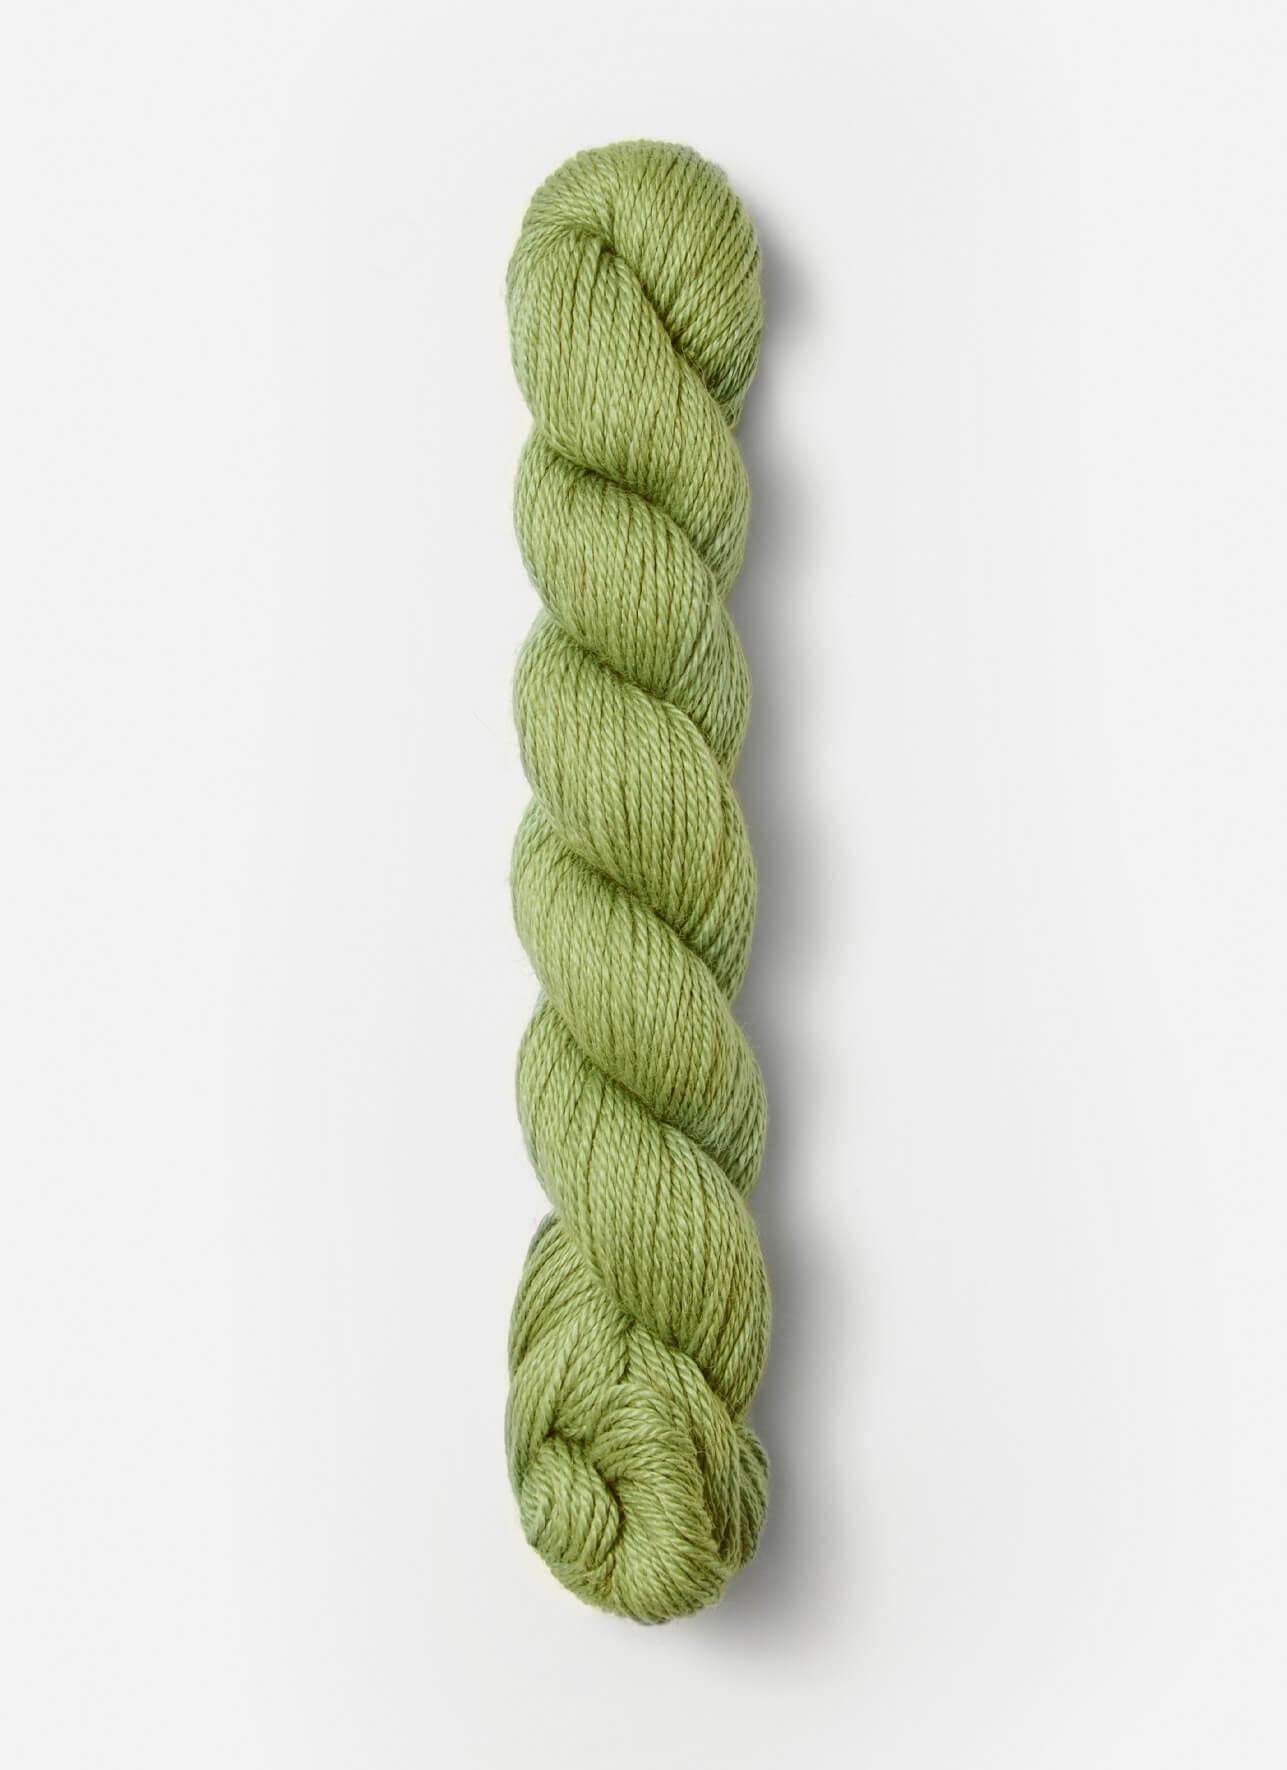 No. 131: Kiwi